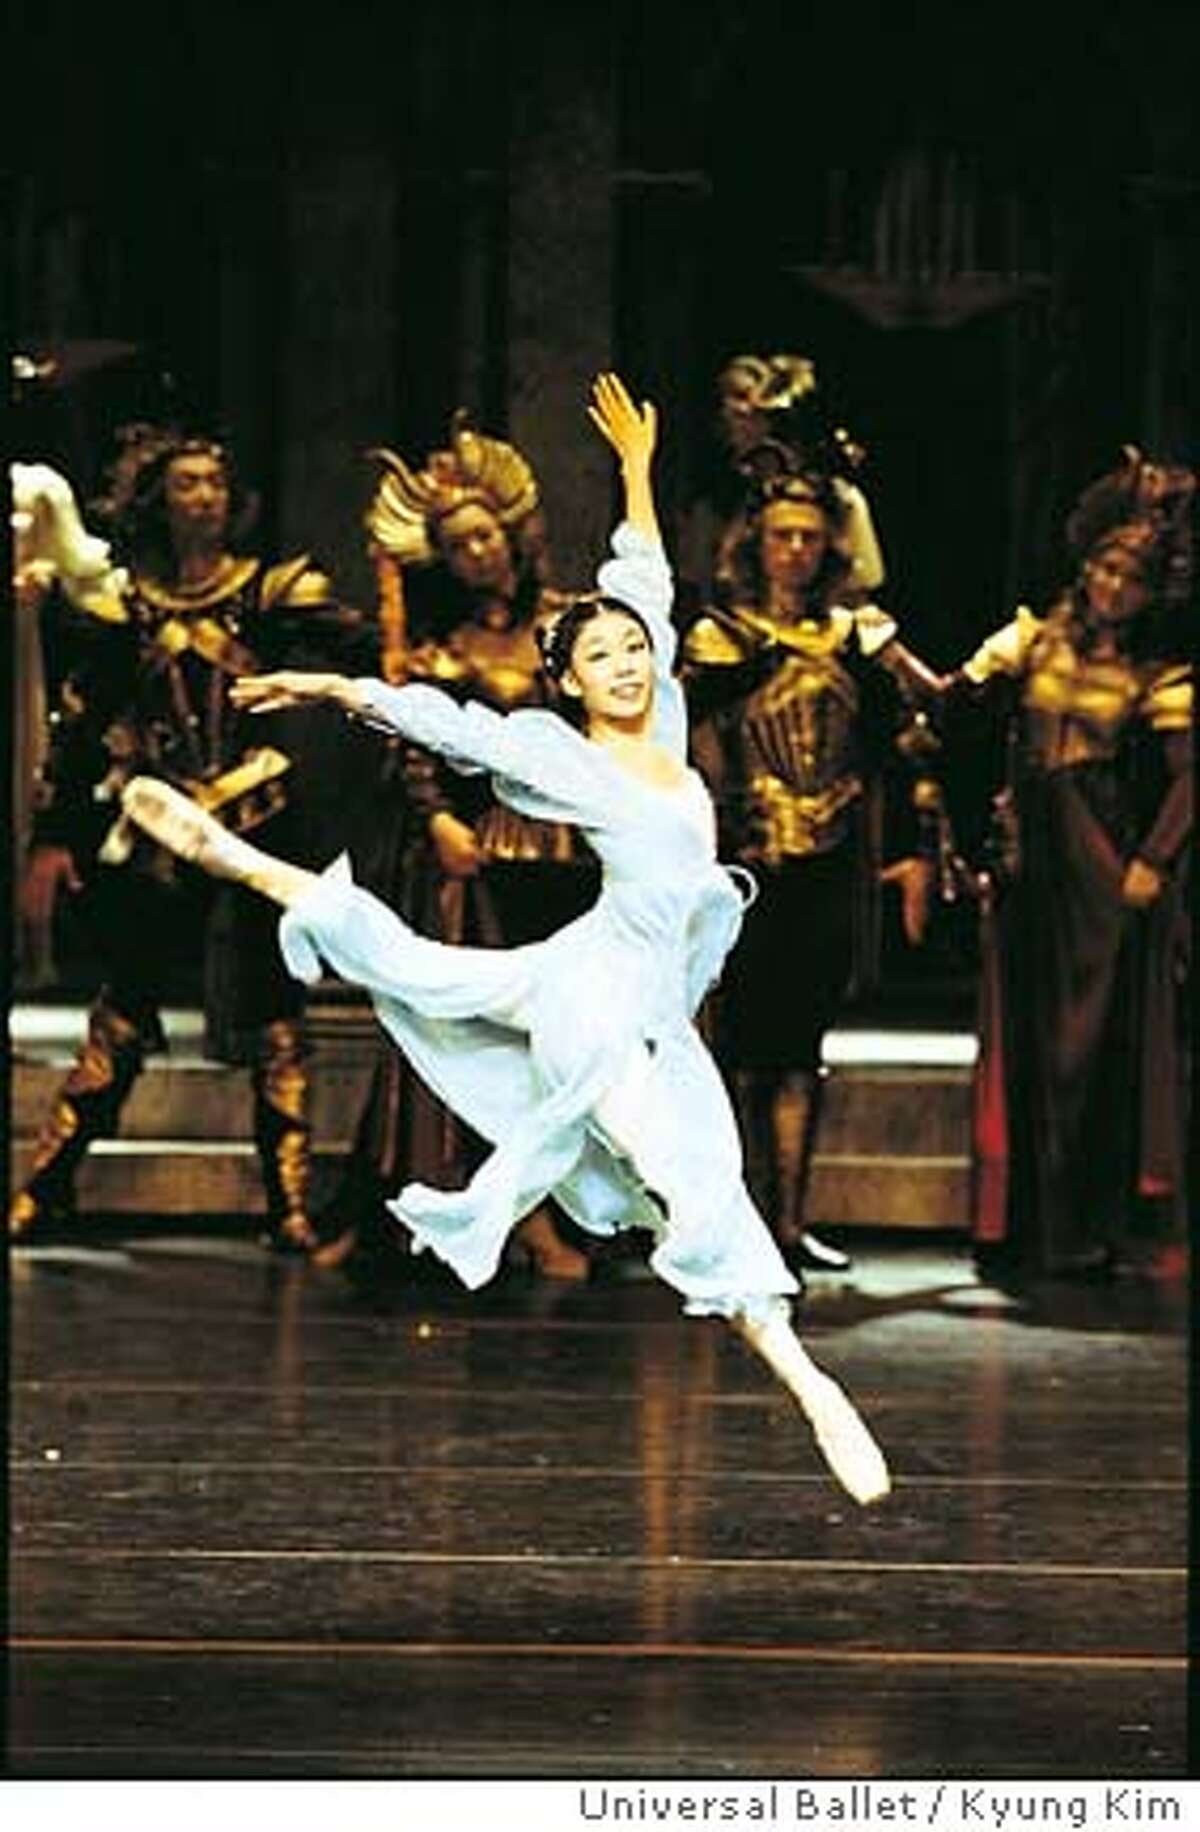 UNIVERSAL1.JPG Wang Yi as Juliet in Universal Ballet�s �Romeo and Juliet� Kyung Kim / HANDOUT